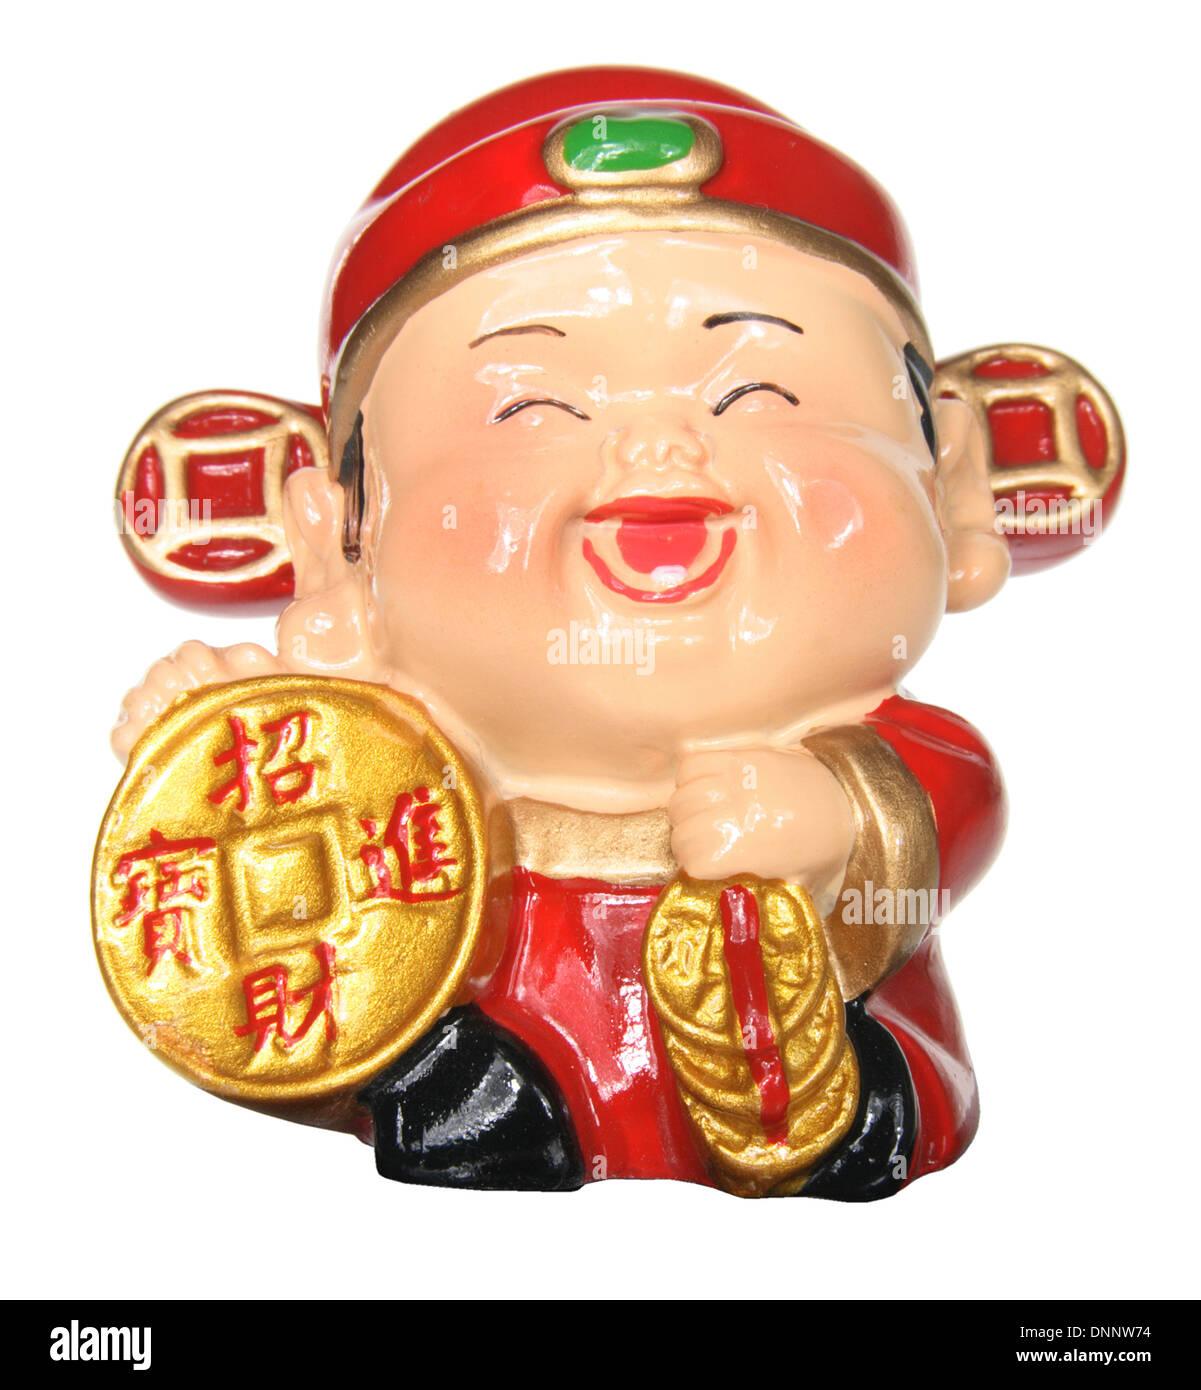 God of Prosperity Figurine - Stock Image